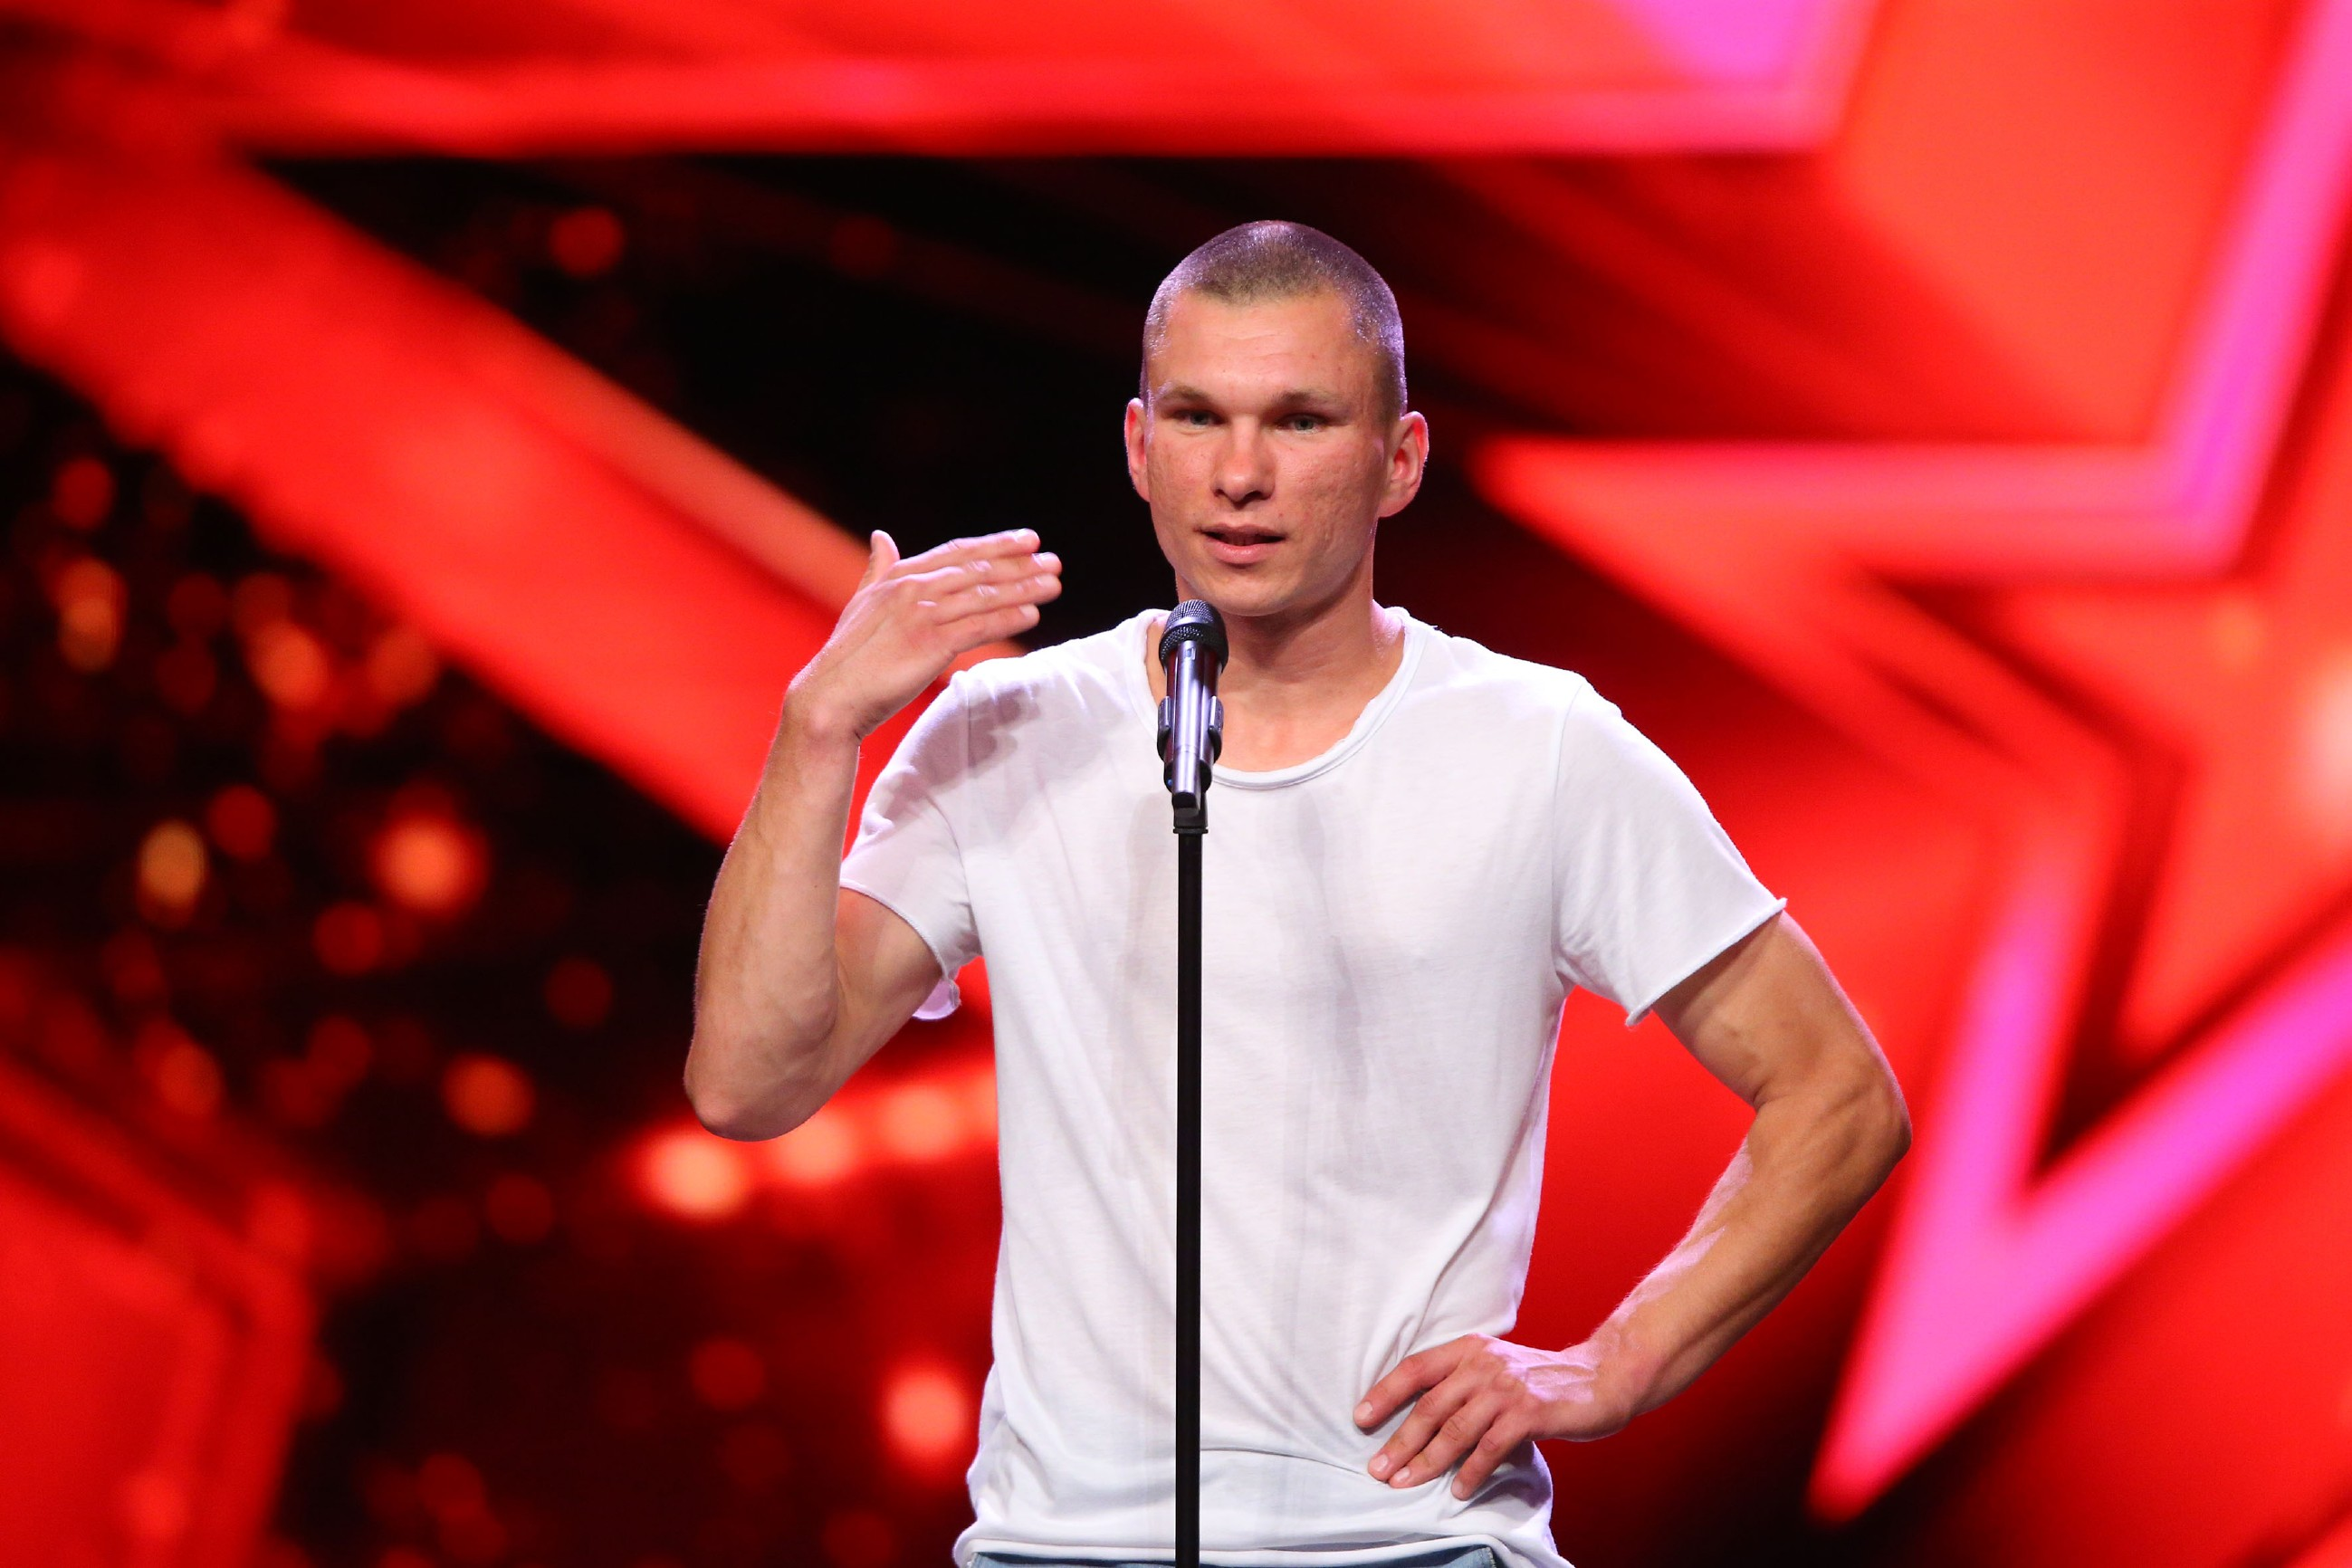 Das Supertalent 2016 Casting 2 - Lukasz Tonia